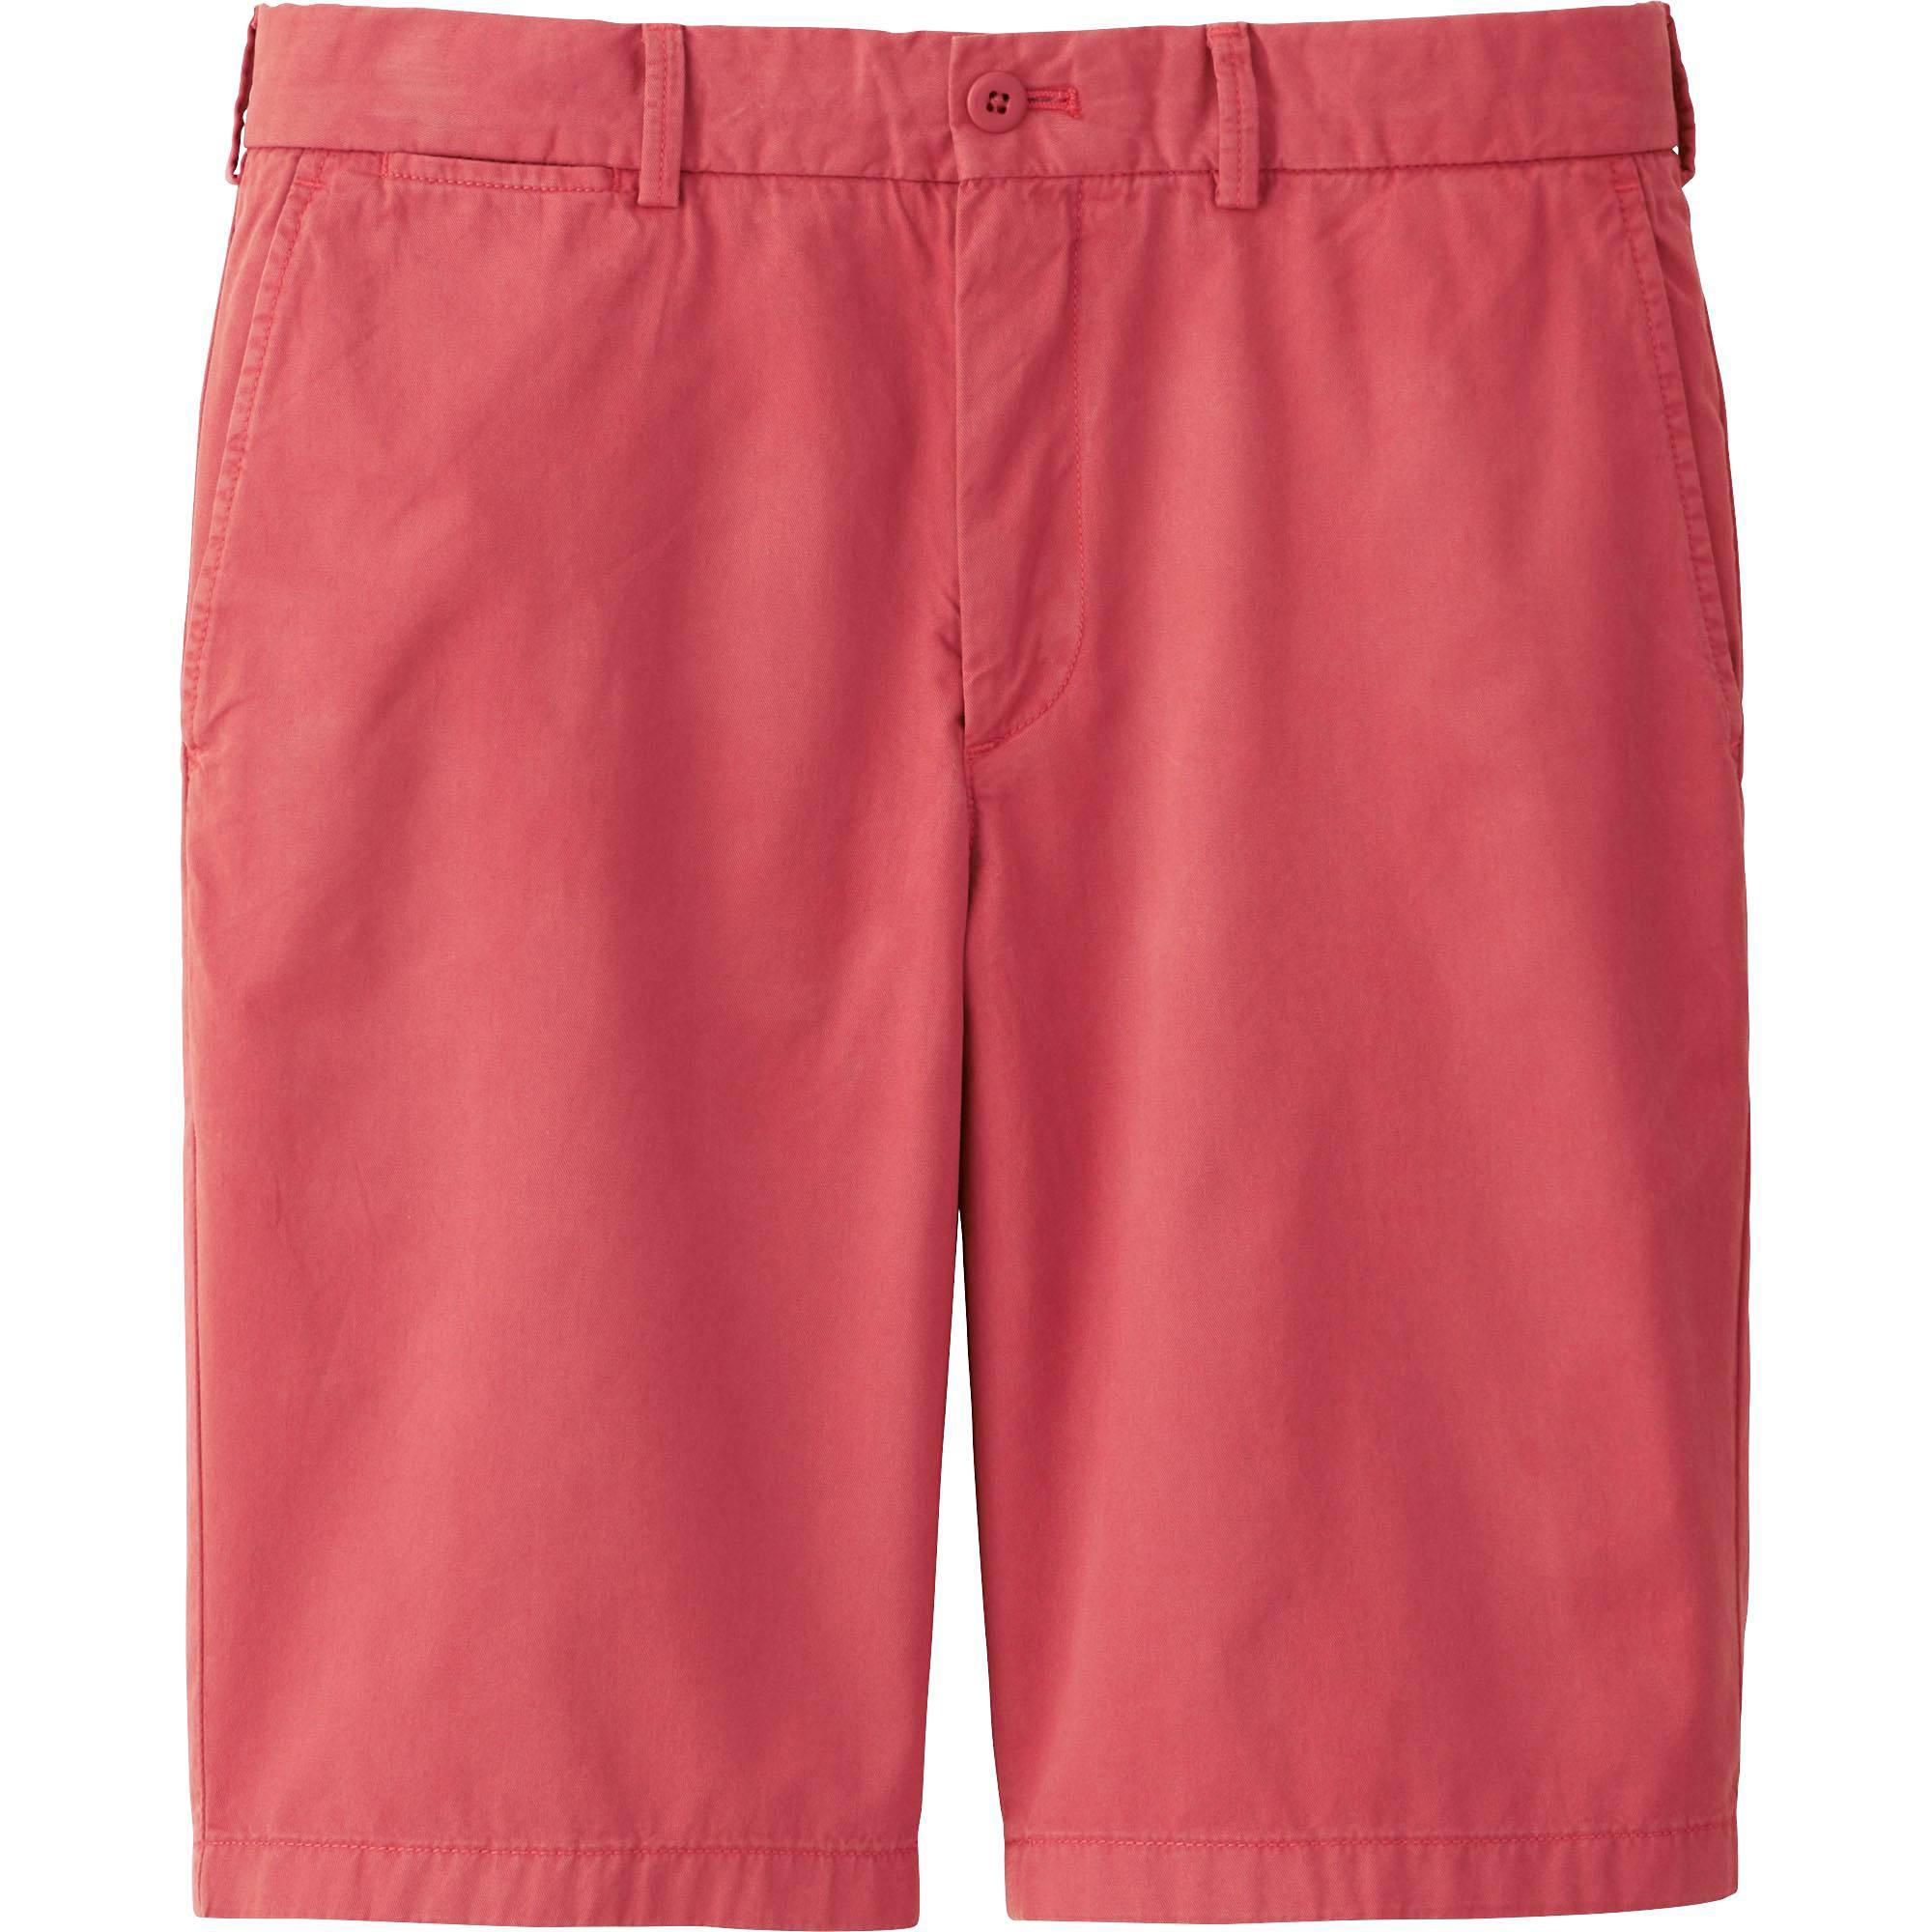 men chino shorts, white, small icvvyzu